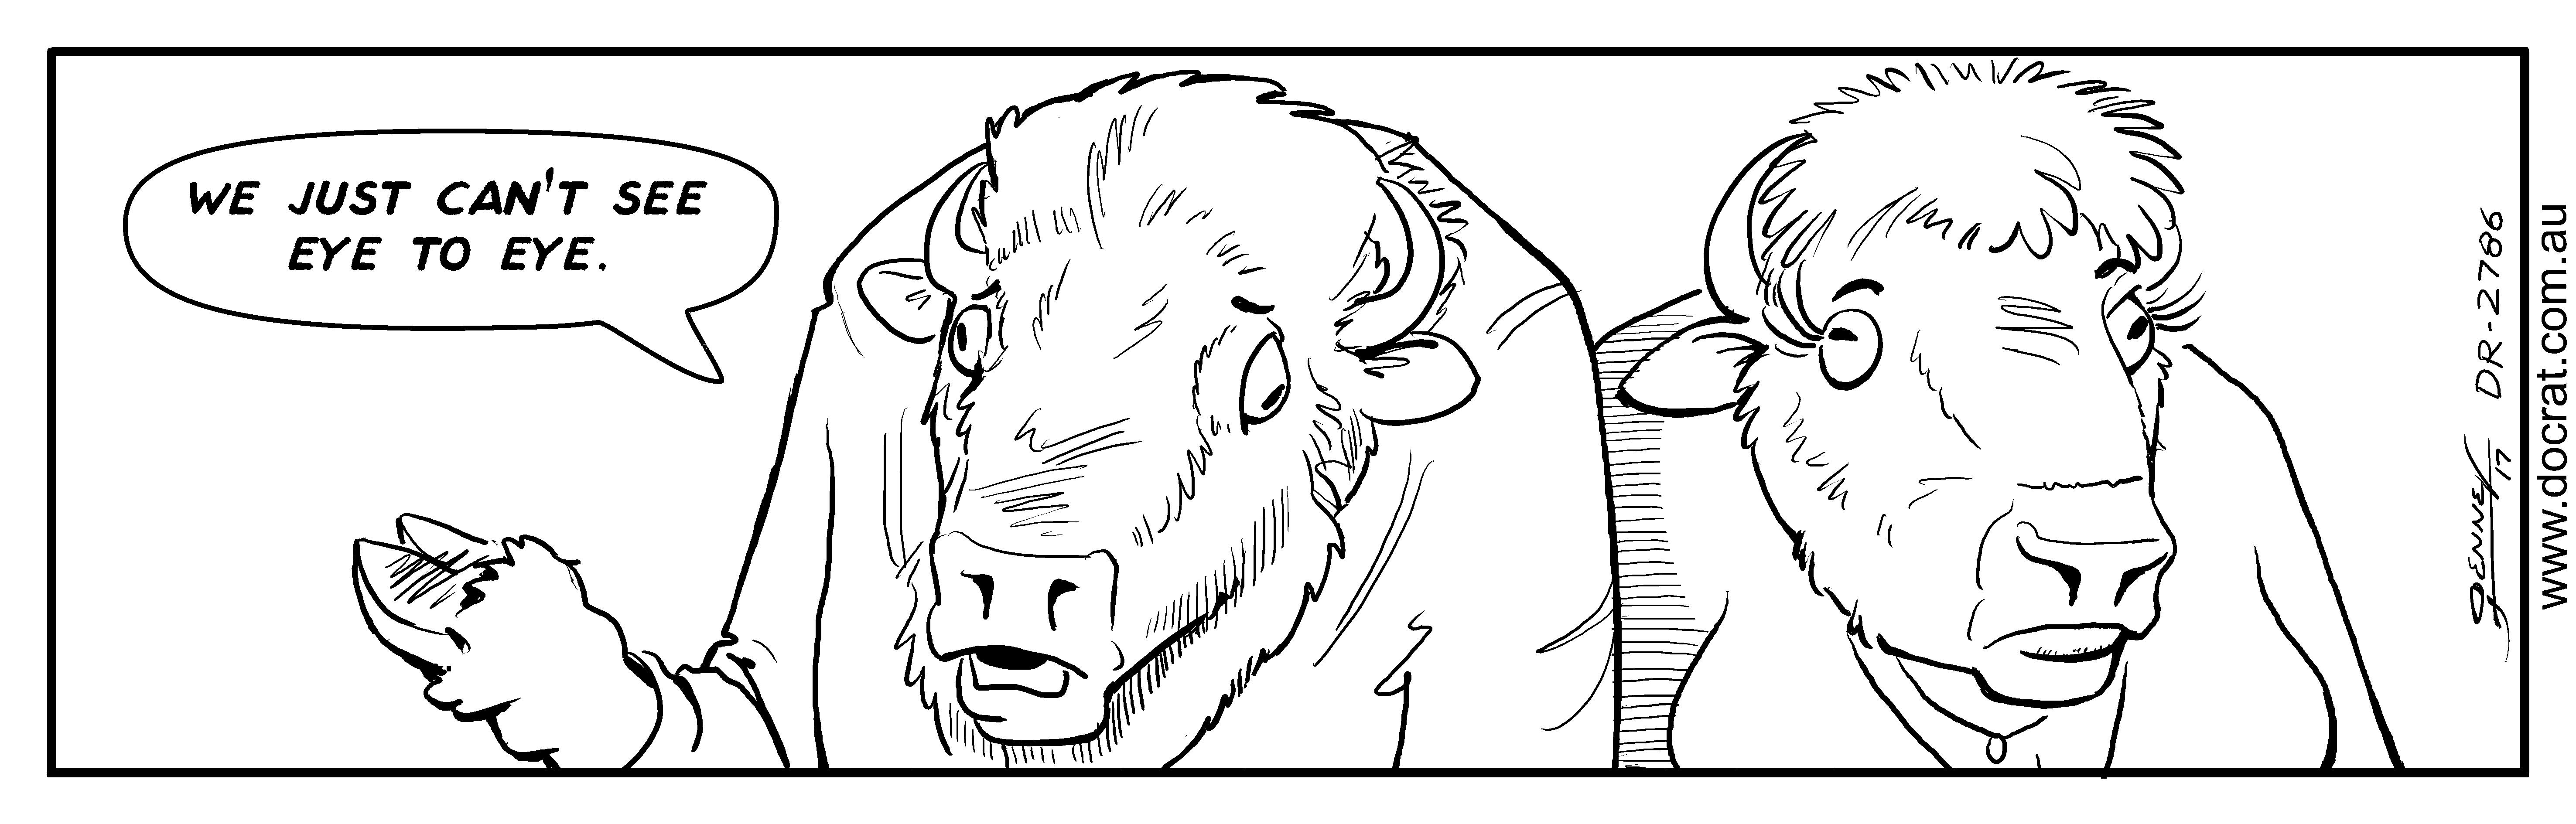 20170529